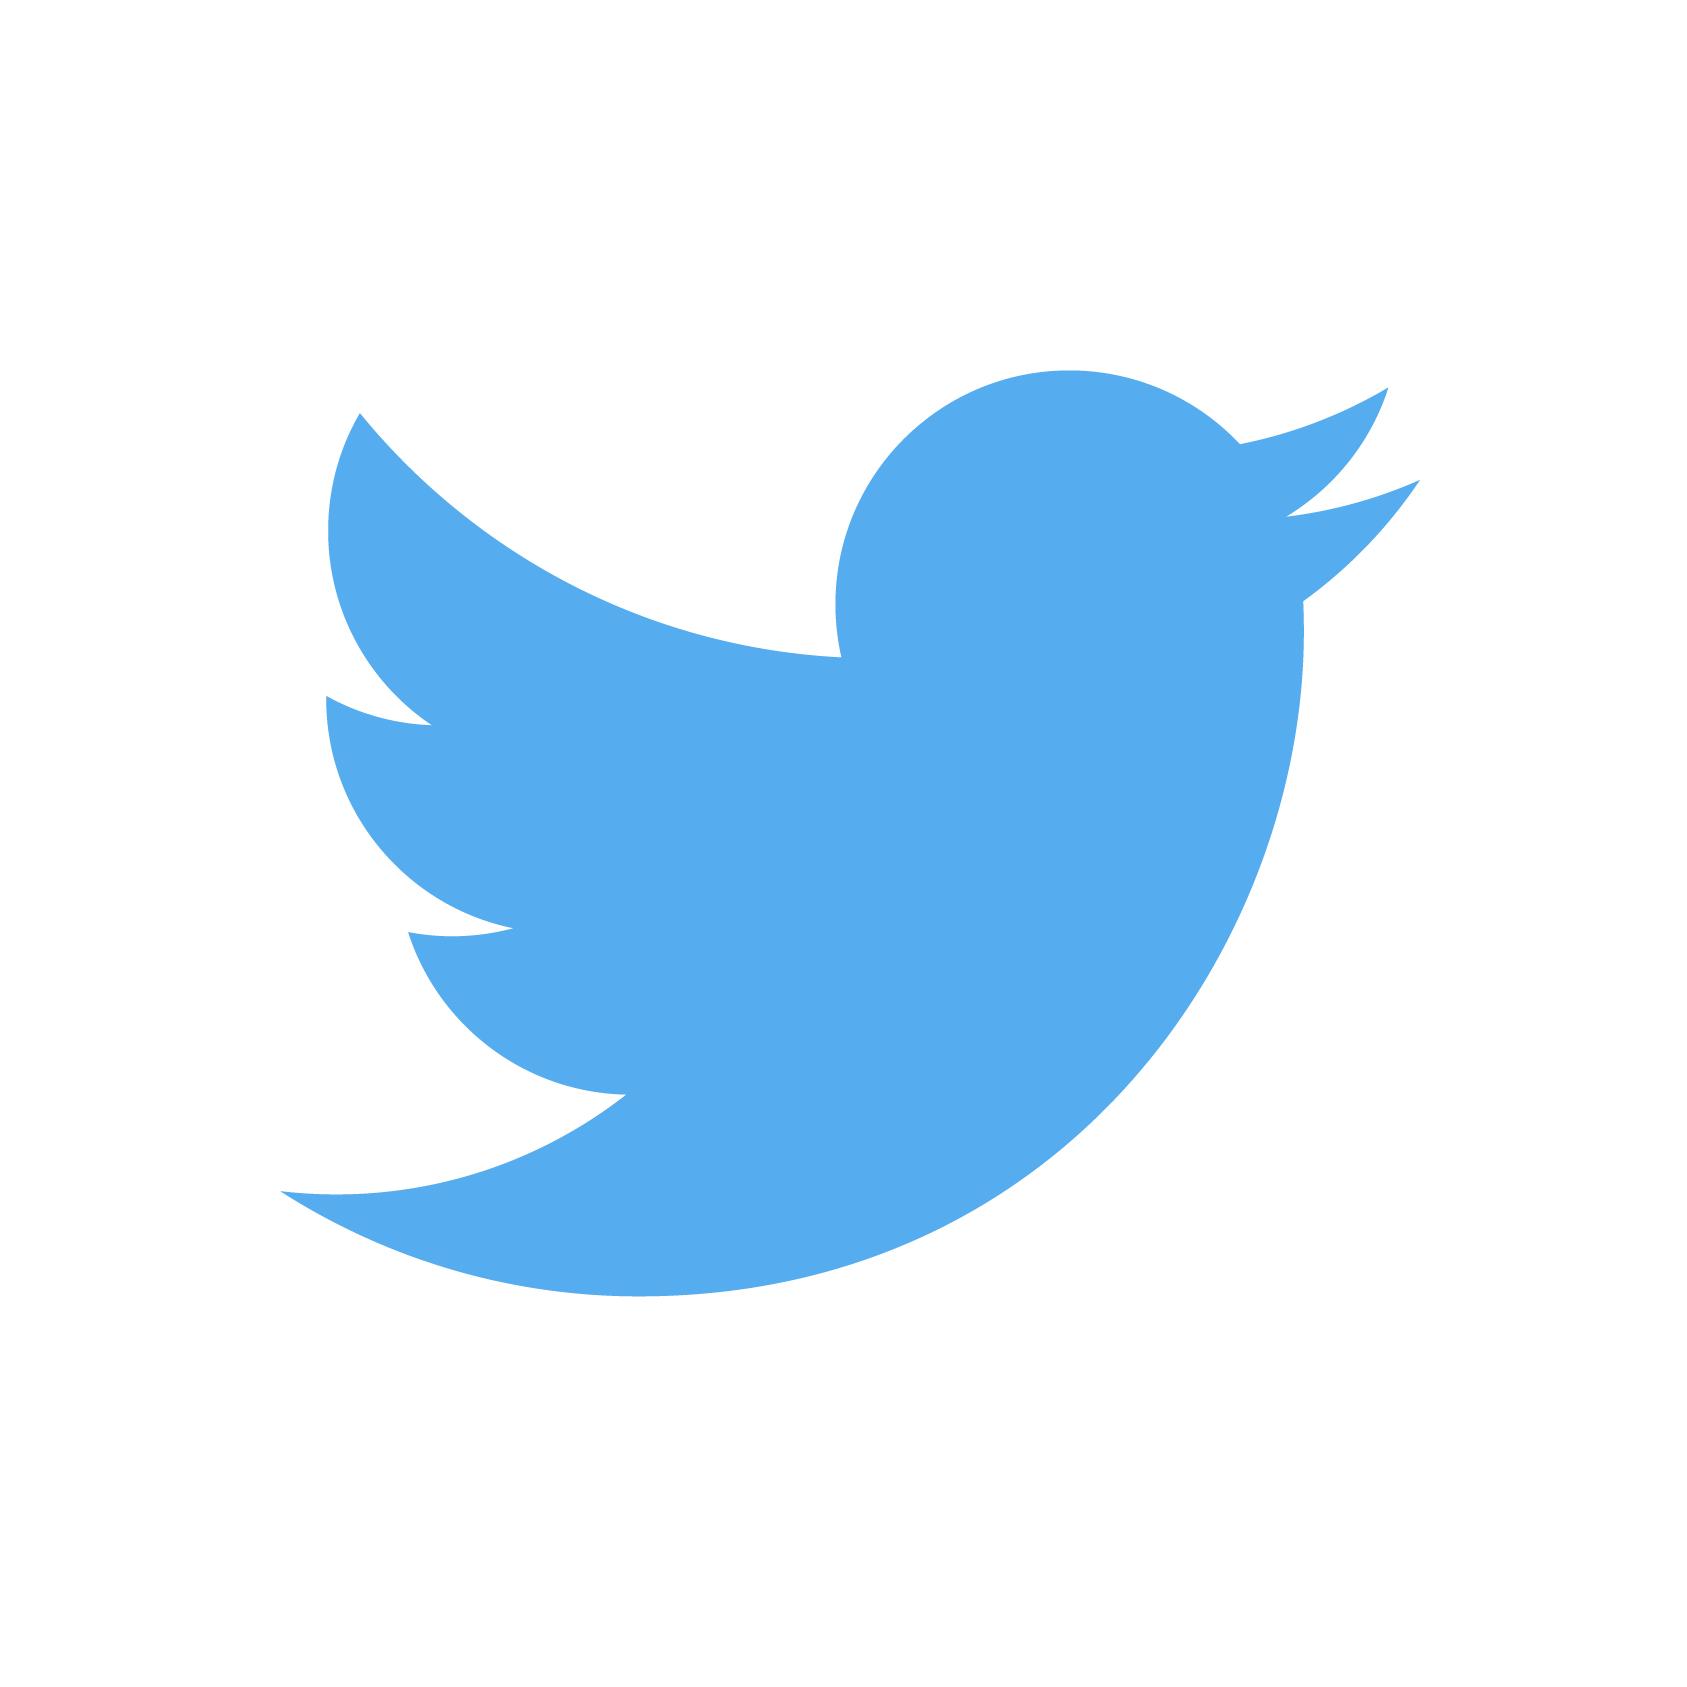 TwitterLogo_#55acee.jpg